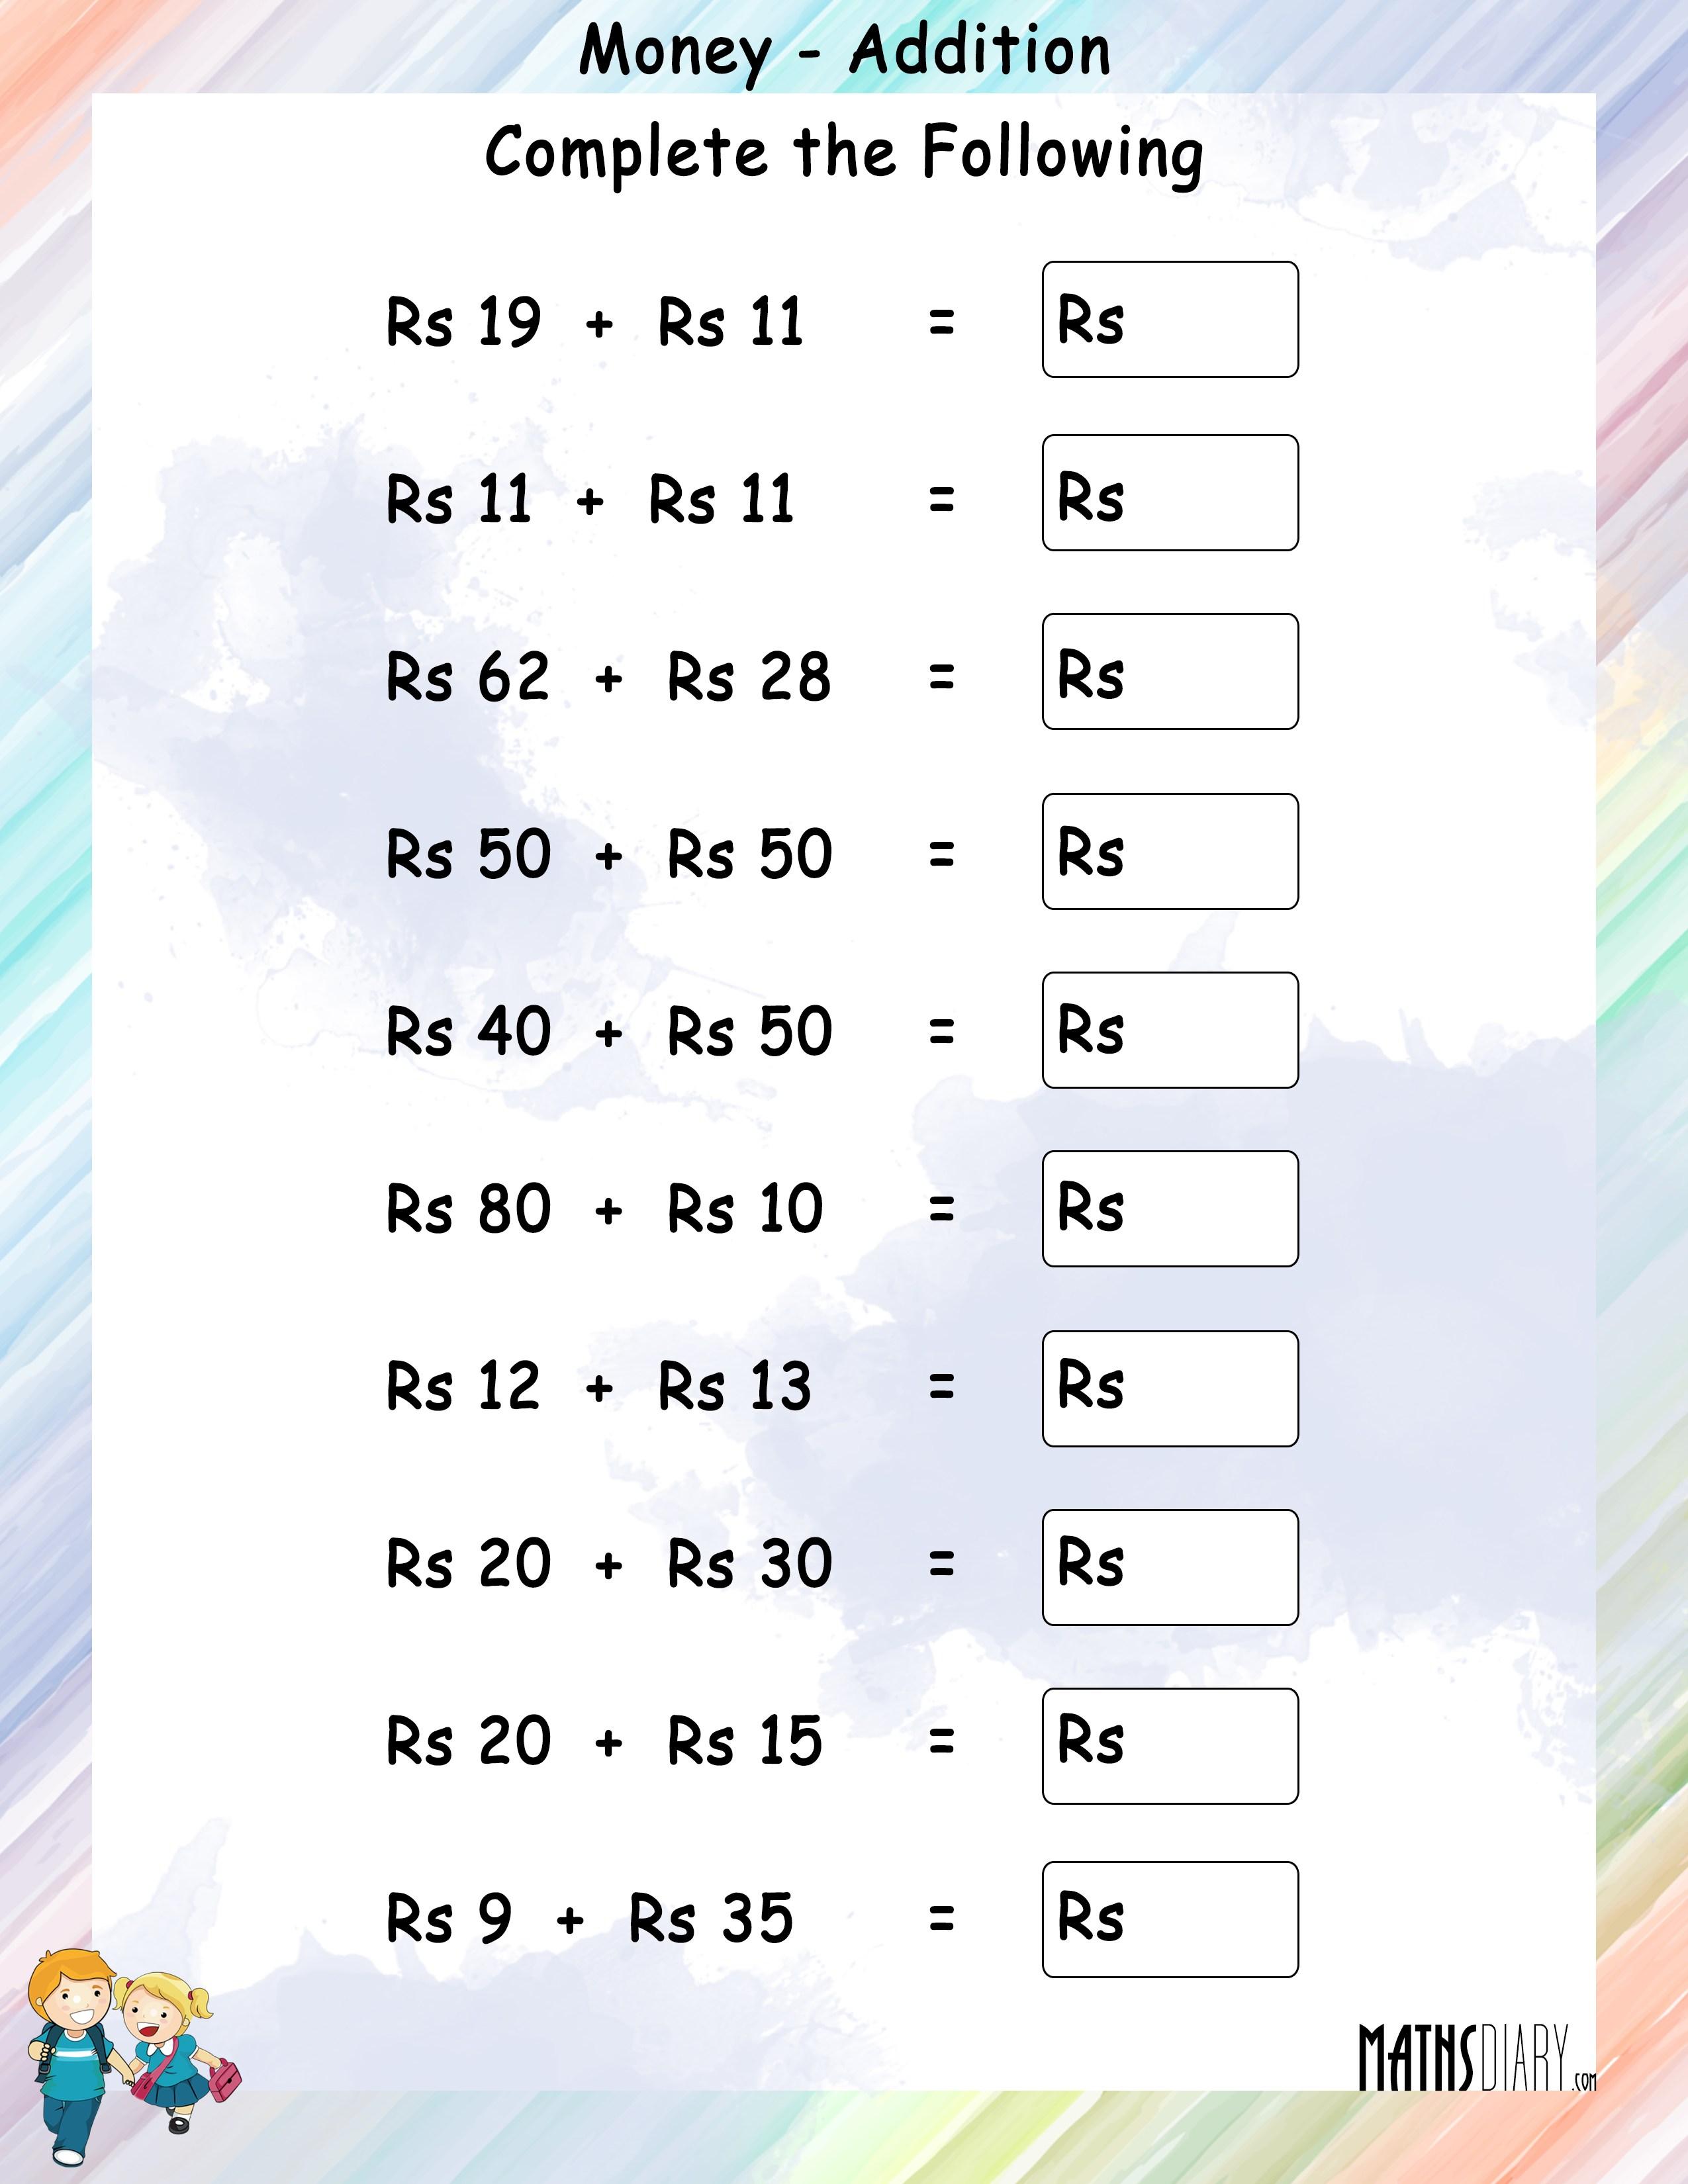 worksheet Money Worksheets Year 4 addition grade 1 math worksheets page 2 of money worksheet 4